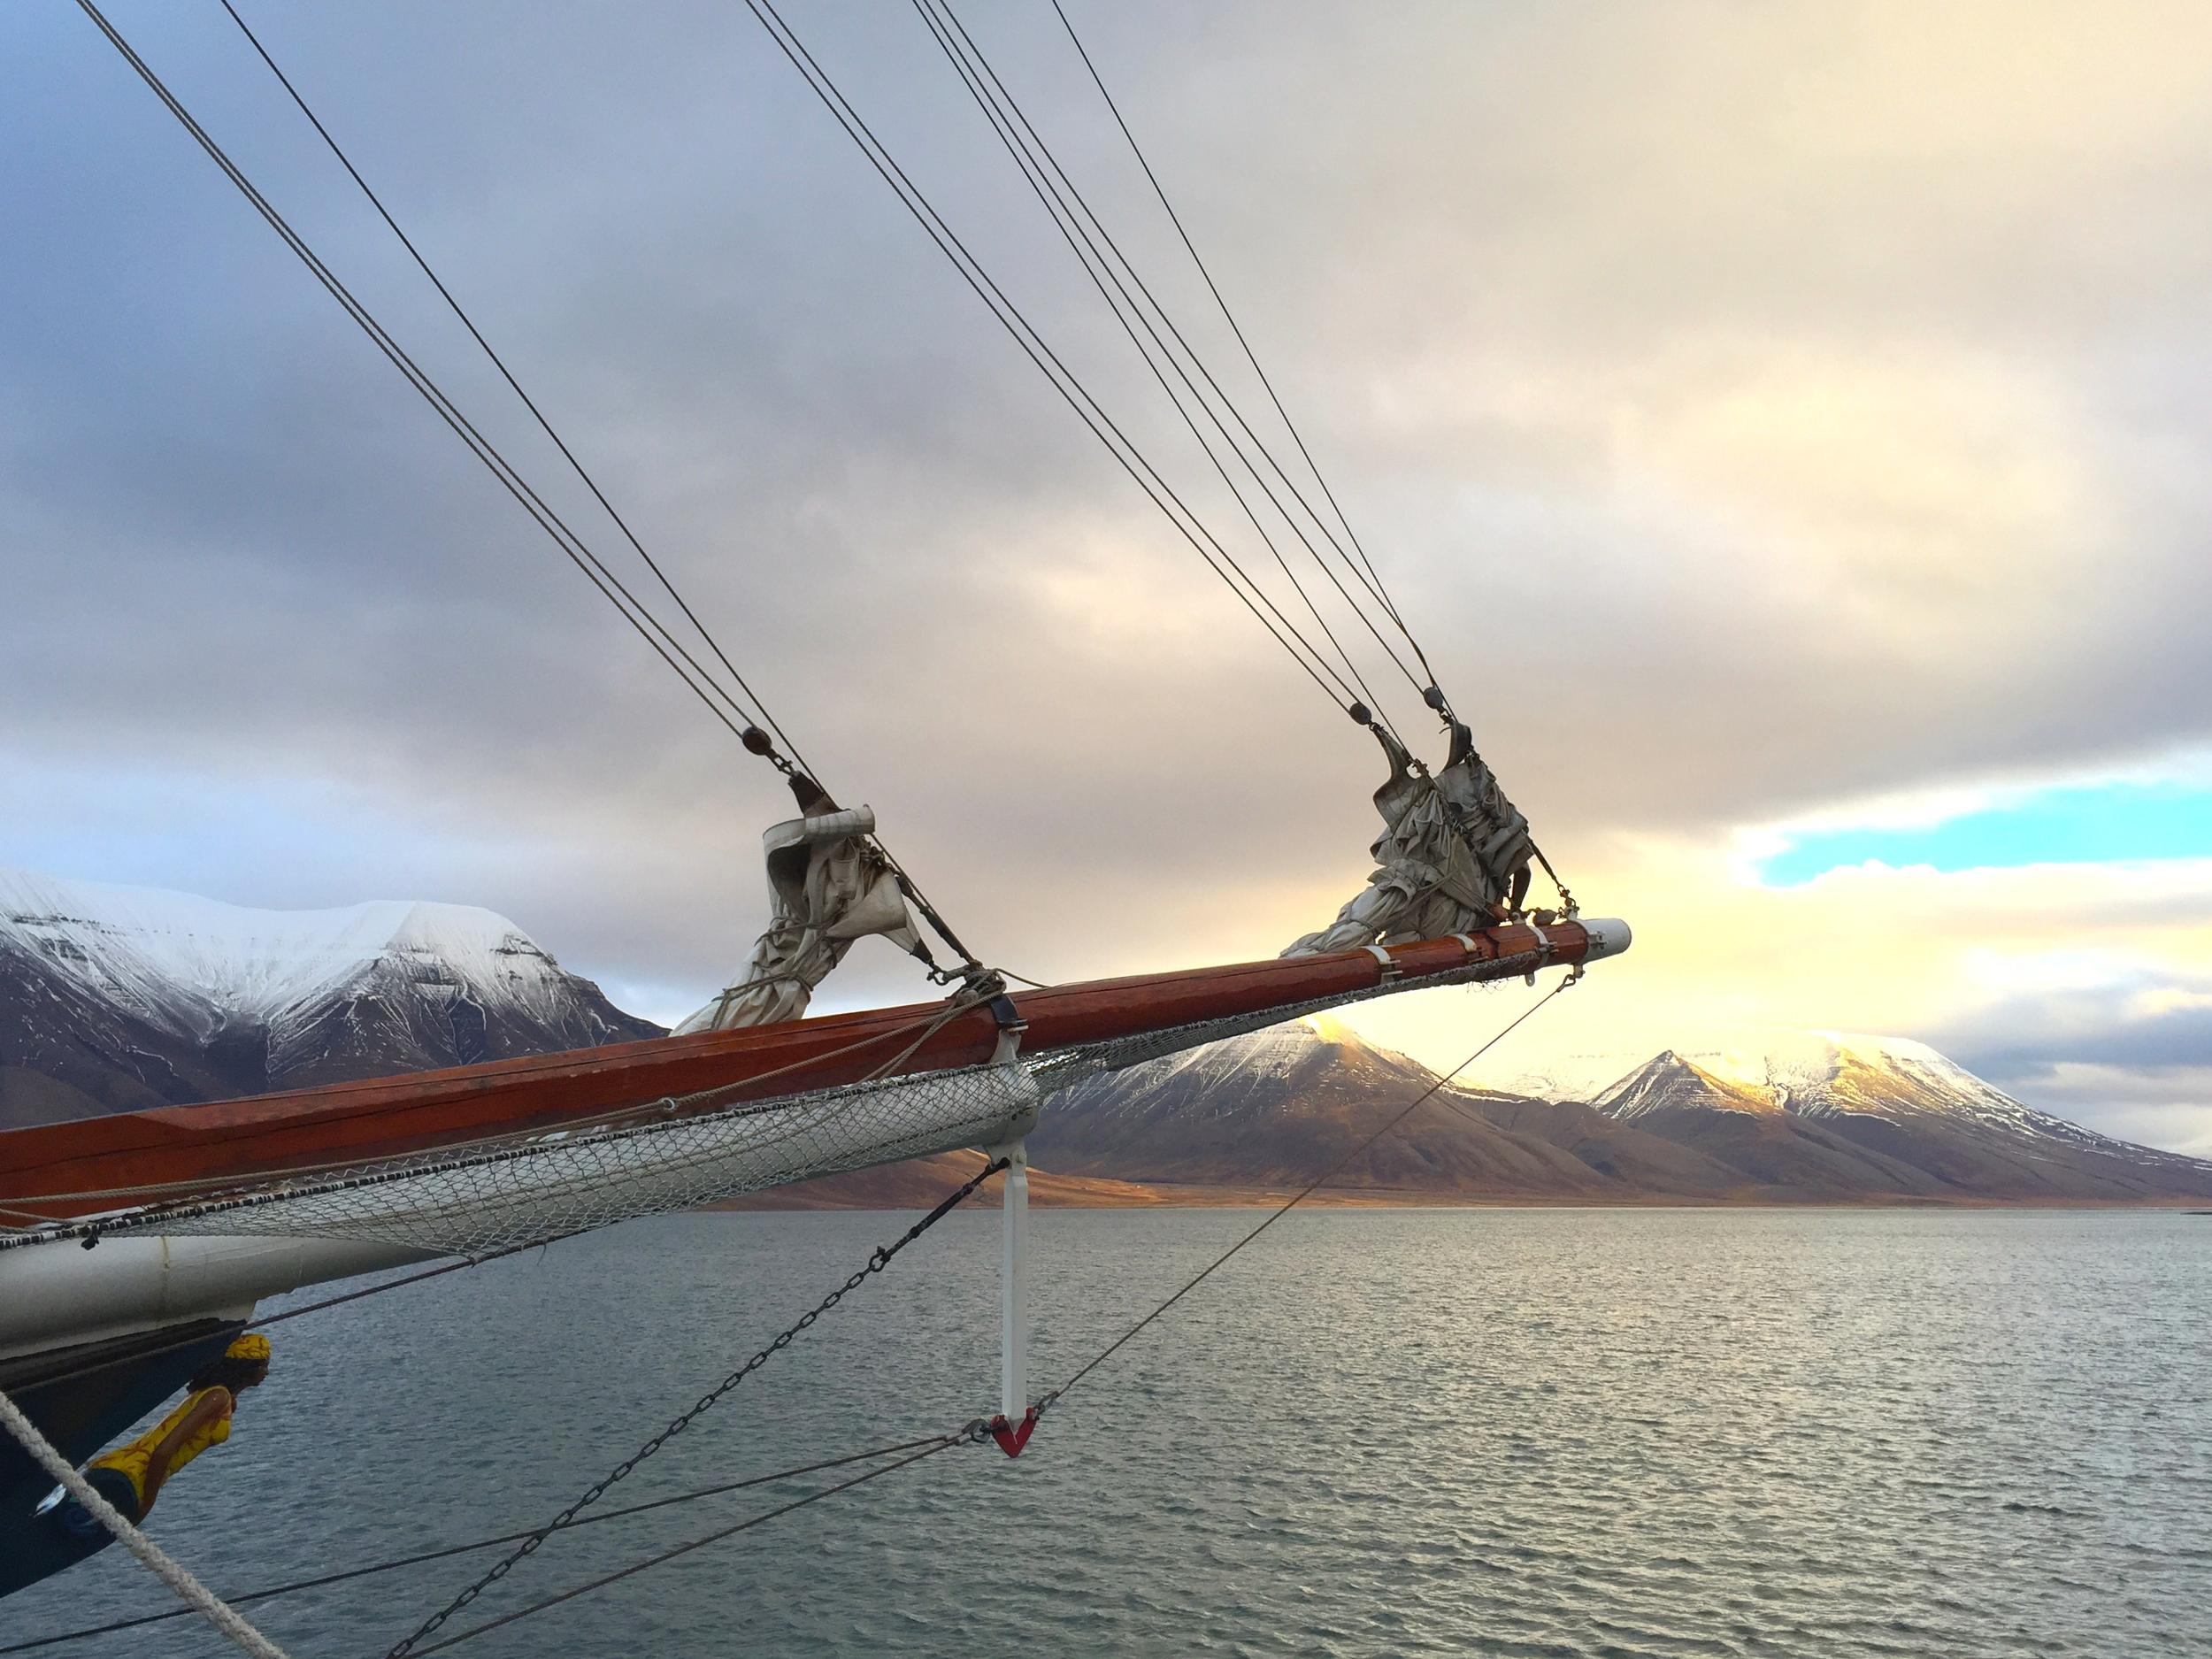 Longyearbyen Harbor and the Antigua